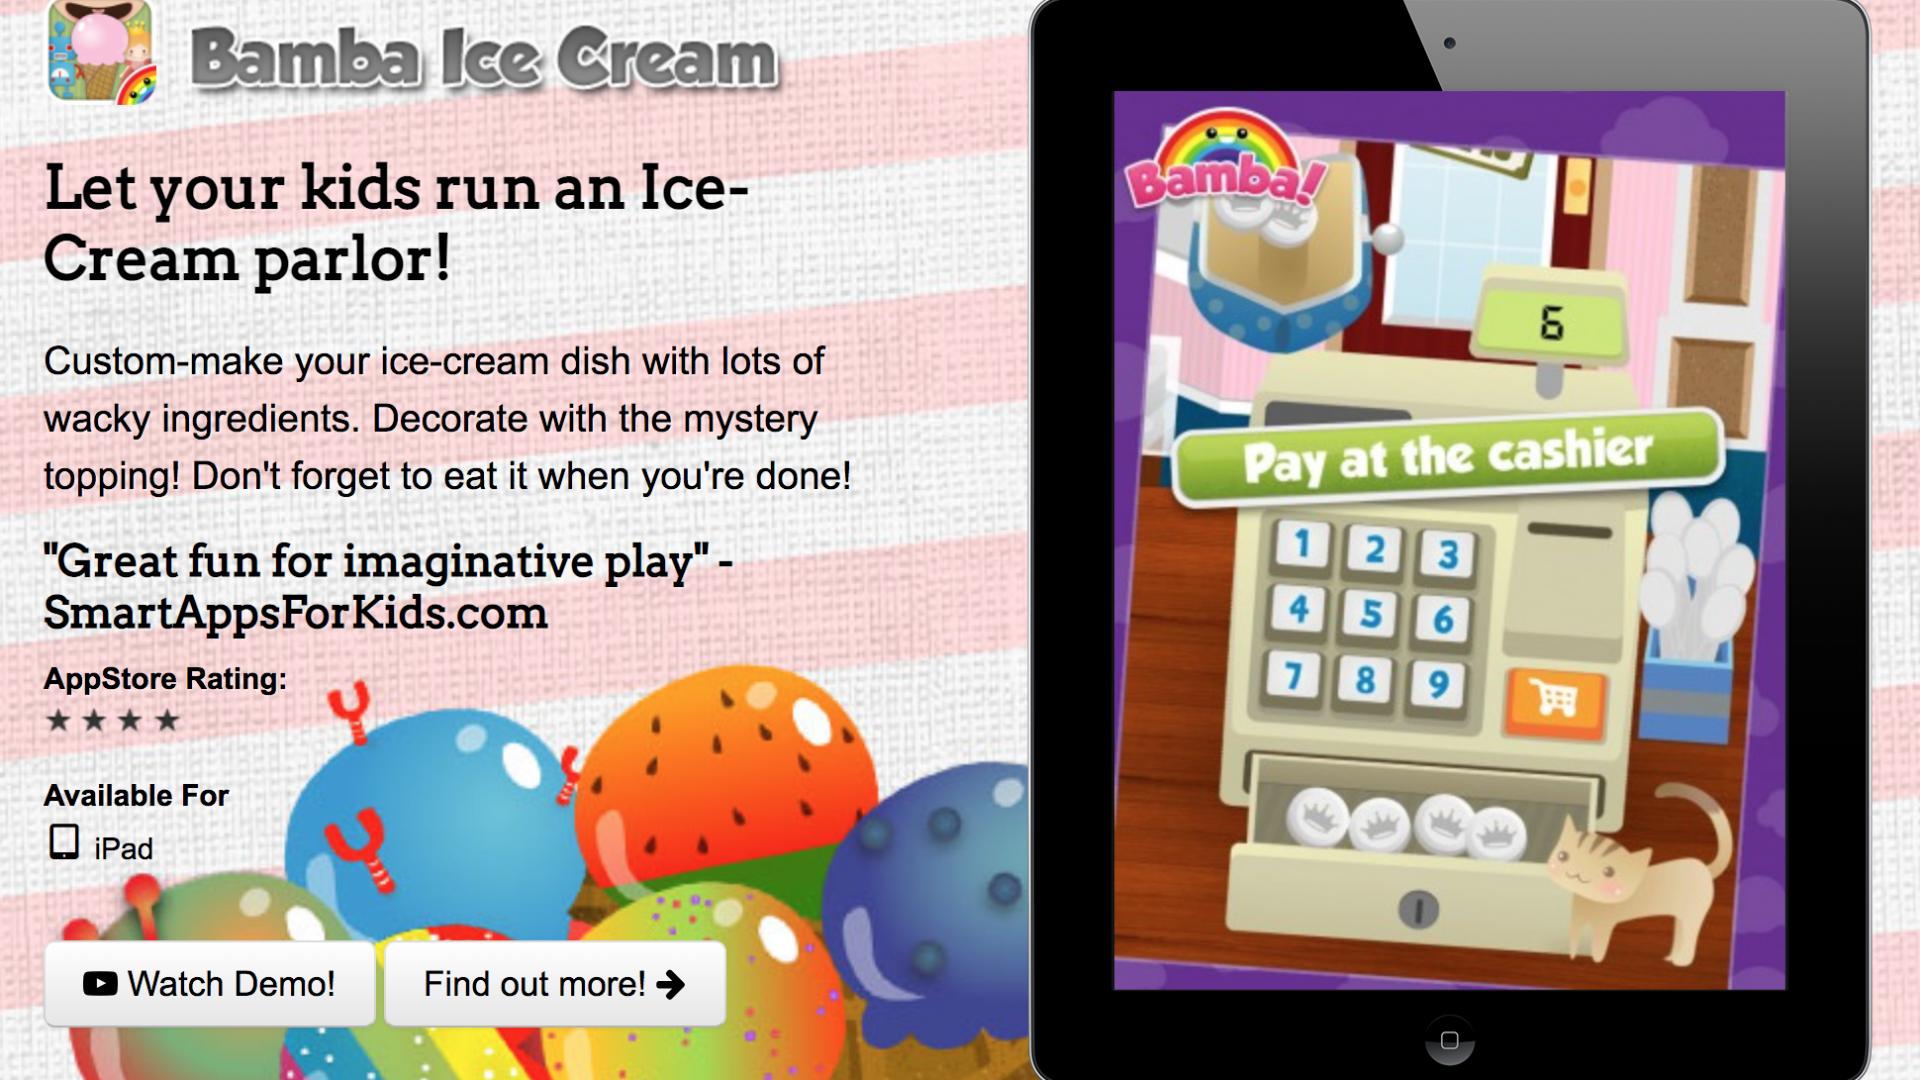 bamba ice cream